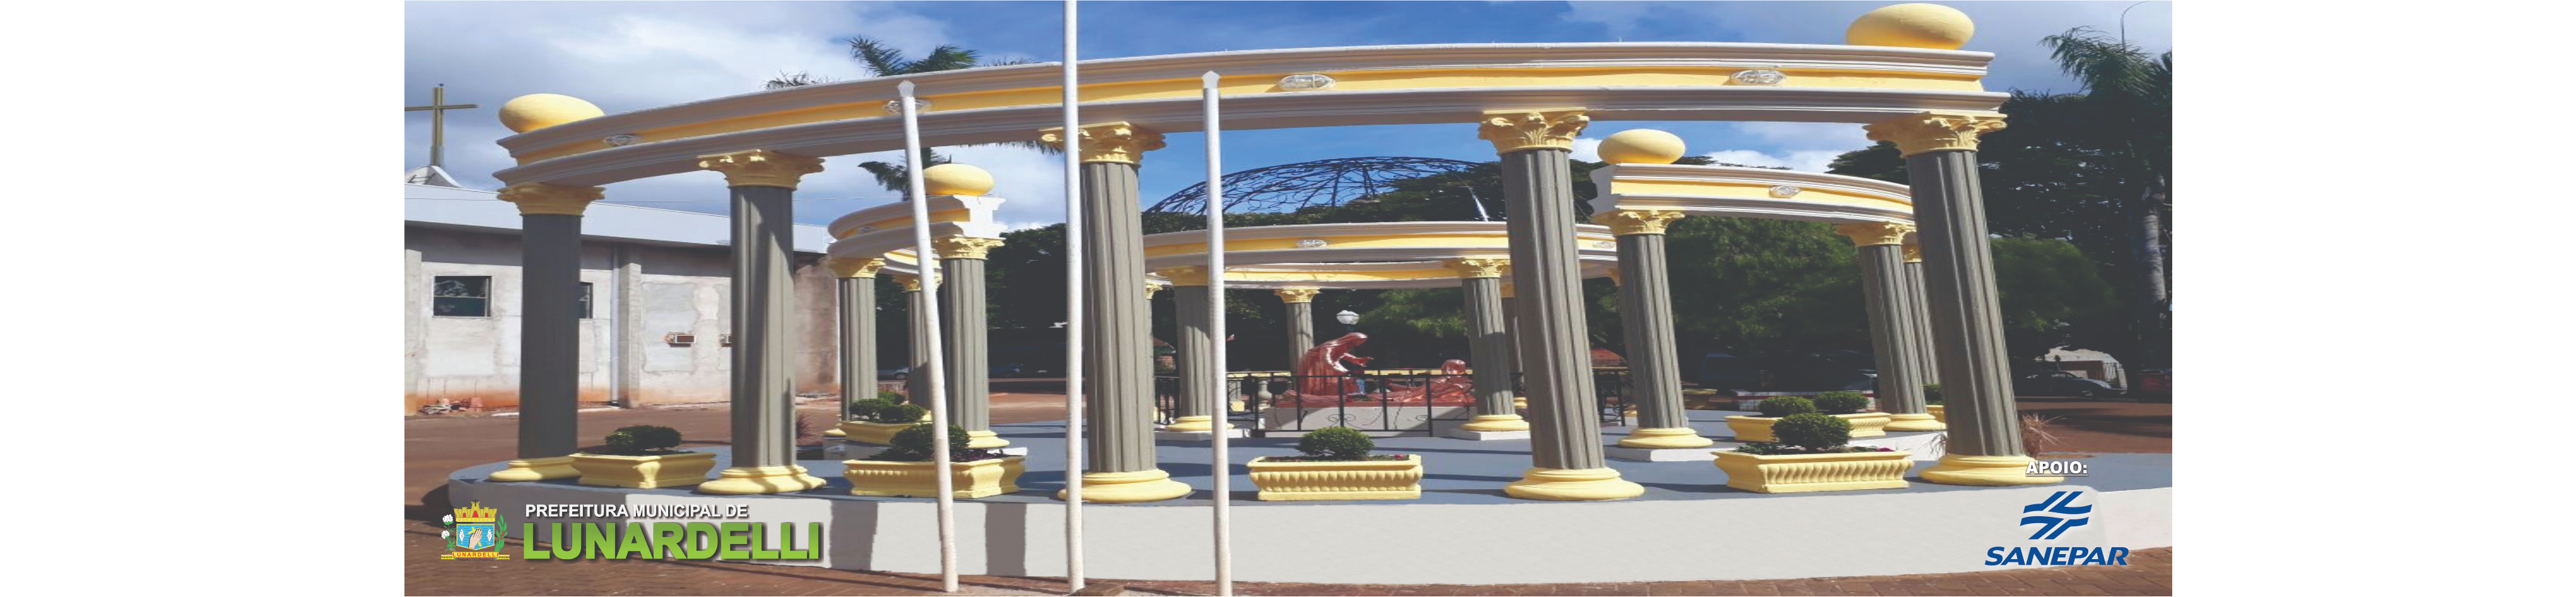 Monumento Praça 4